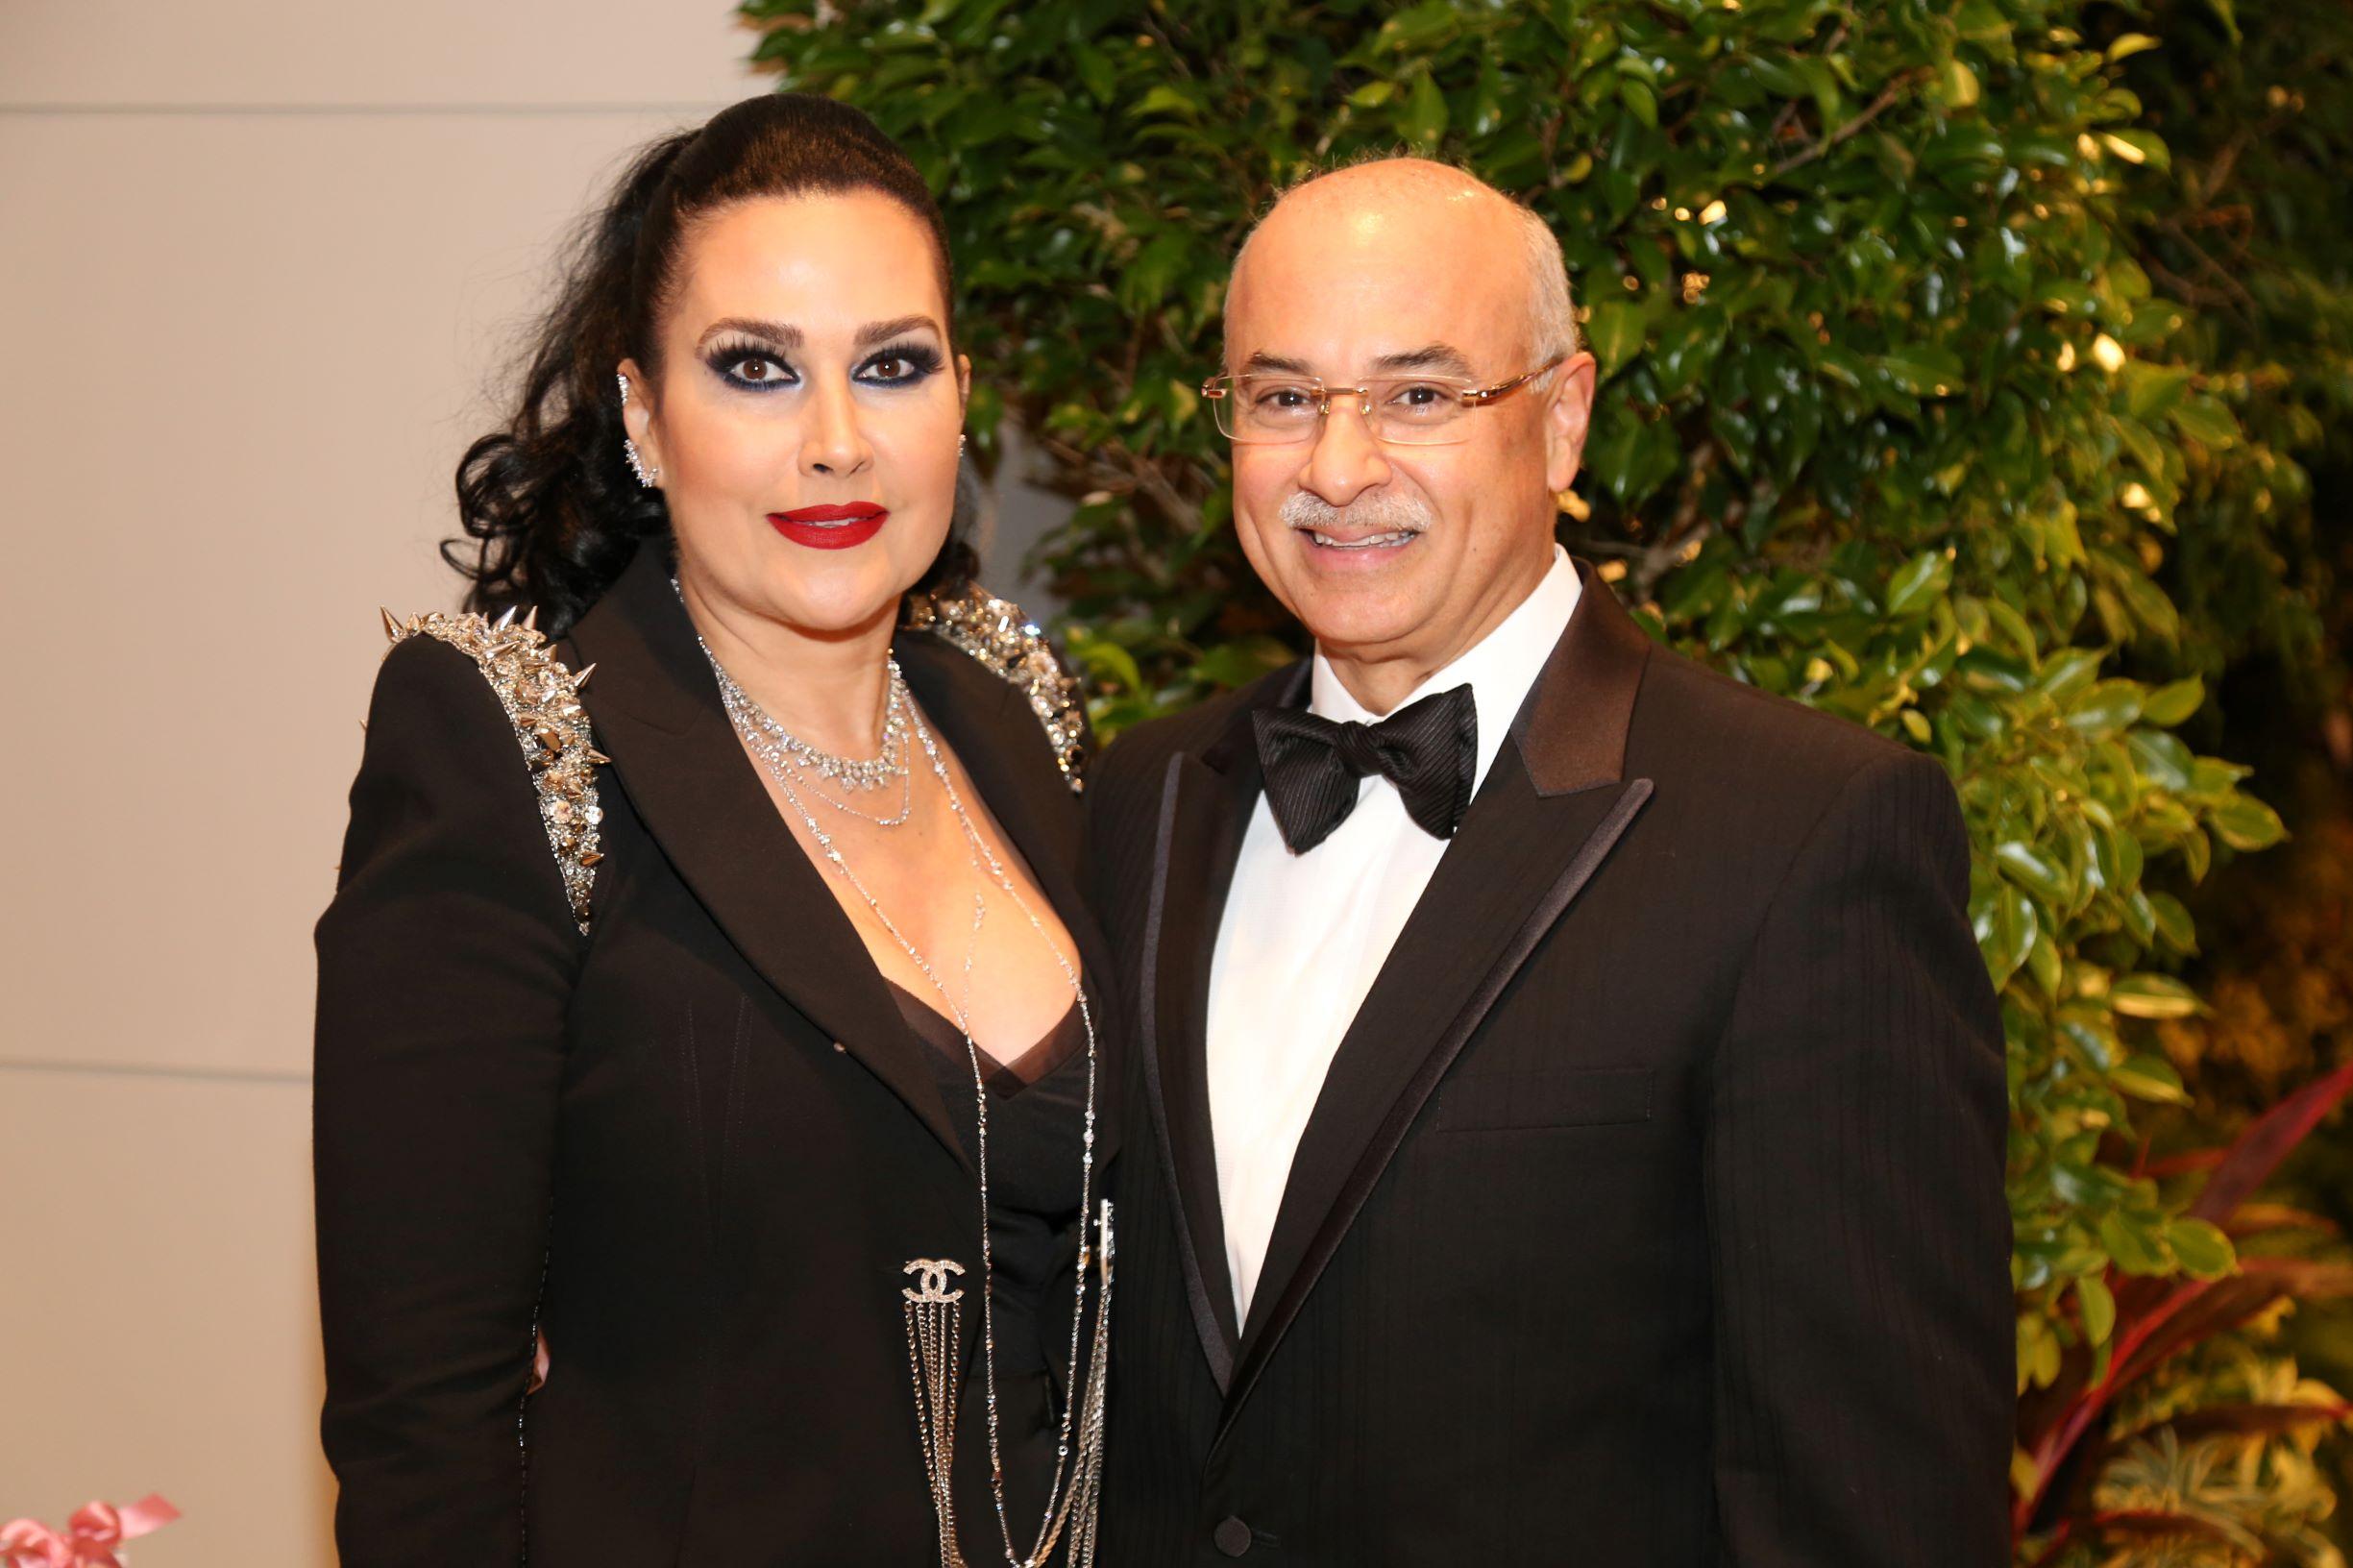 Lourdes Sepúlveda y Víctor Rodríguez (Nichole Saldarriaga)